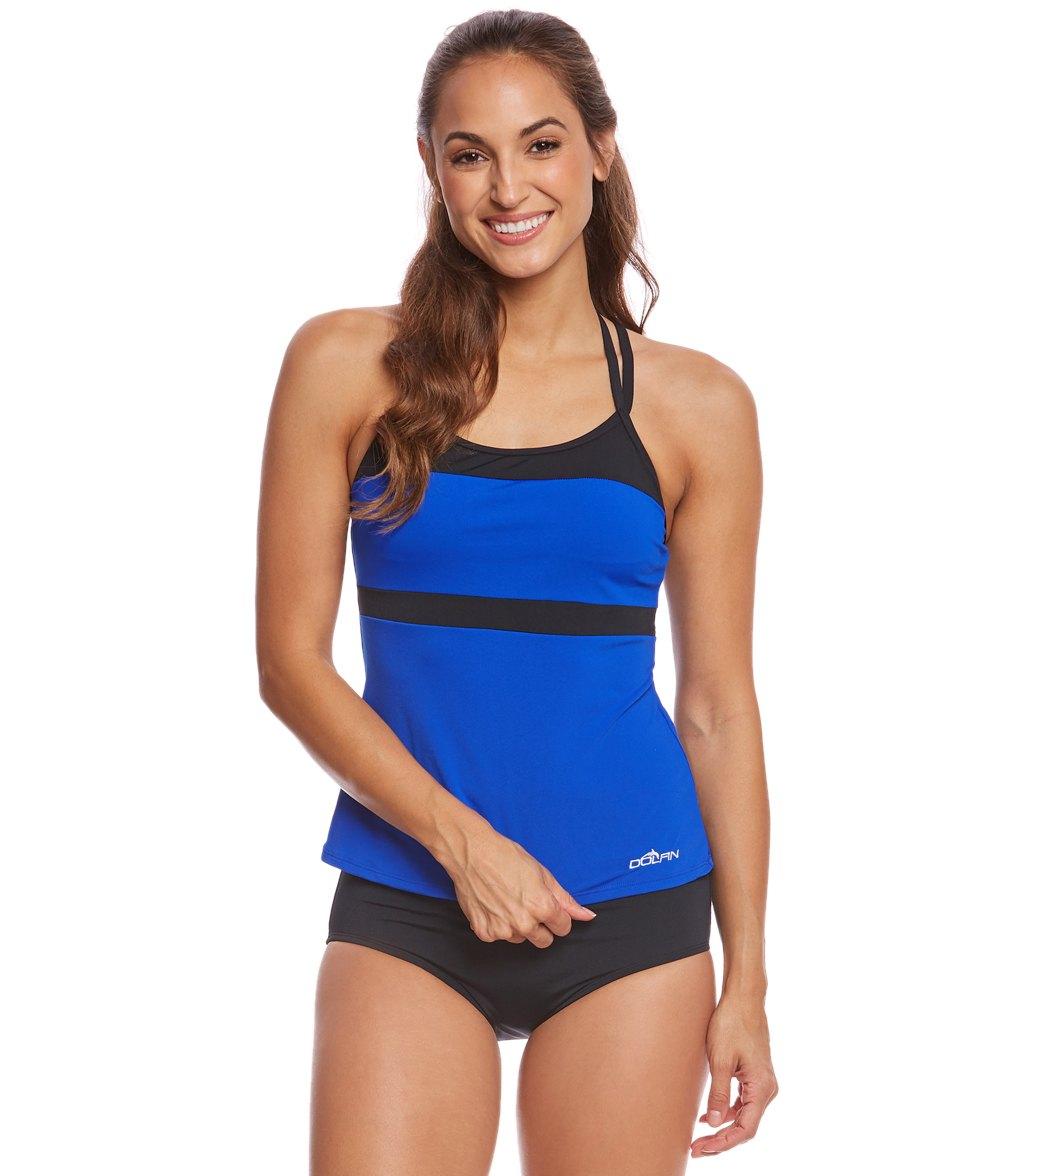 698c7bb4a9 Dolfin Aquashape Women's T-Strap Tankini Top at SwimOutlet.com - Free  Shipping